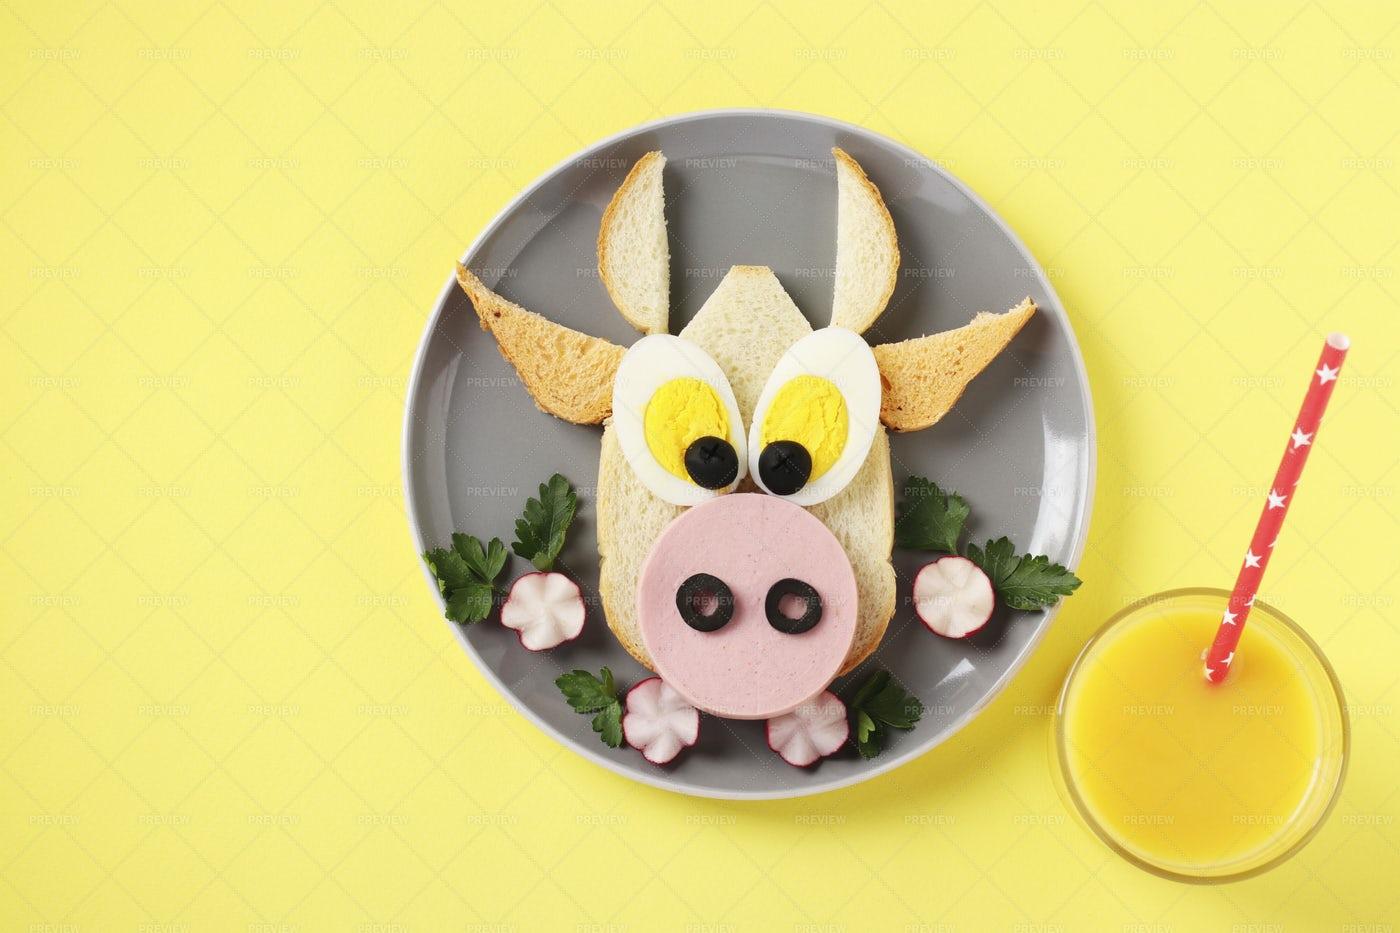 Designed Sandwich: Stock Photos